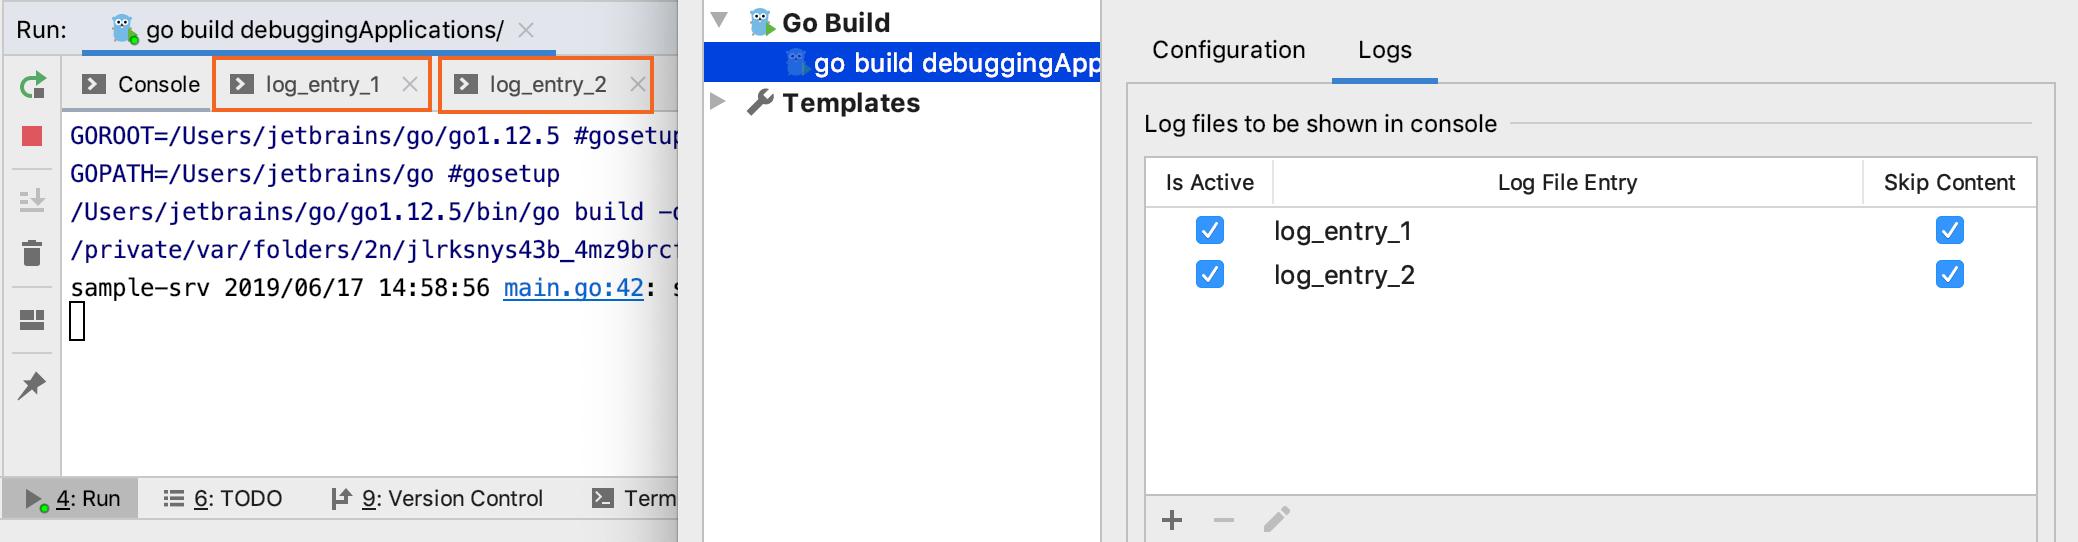 Configure log entries